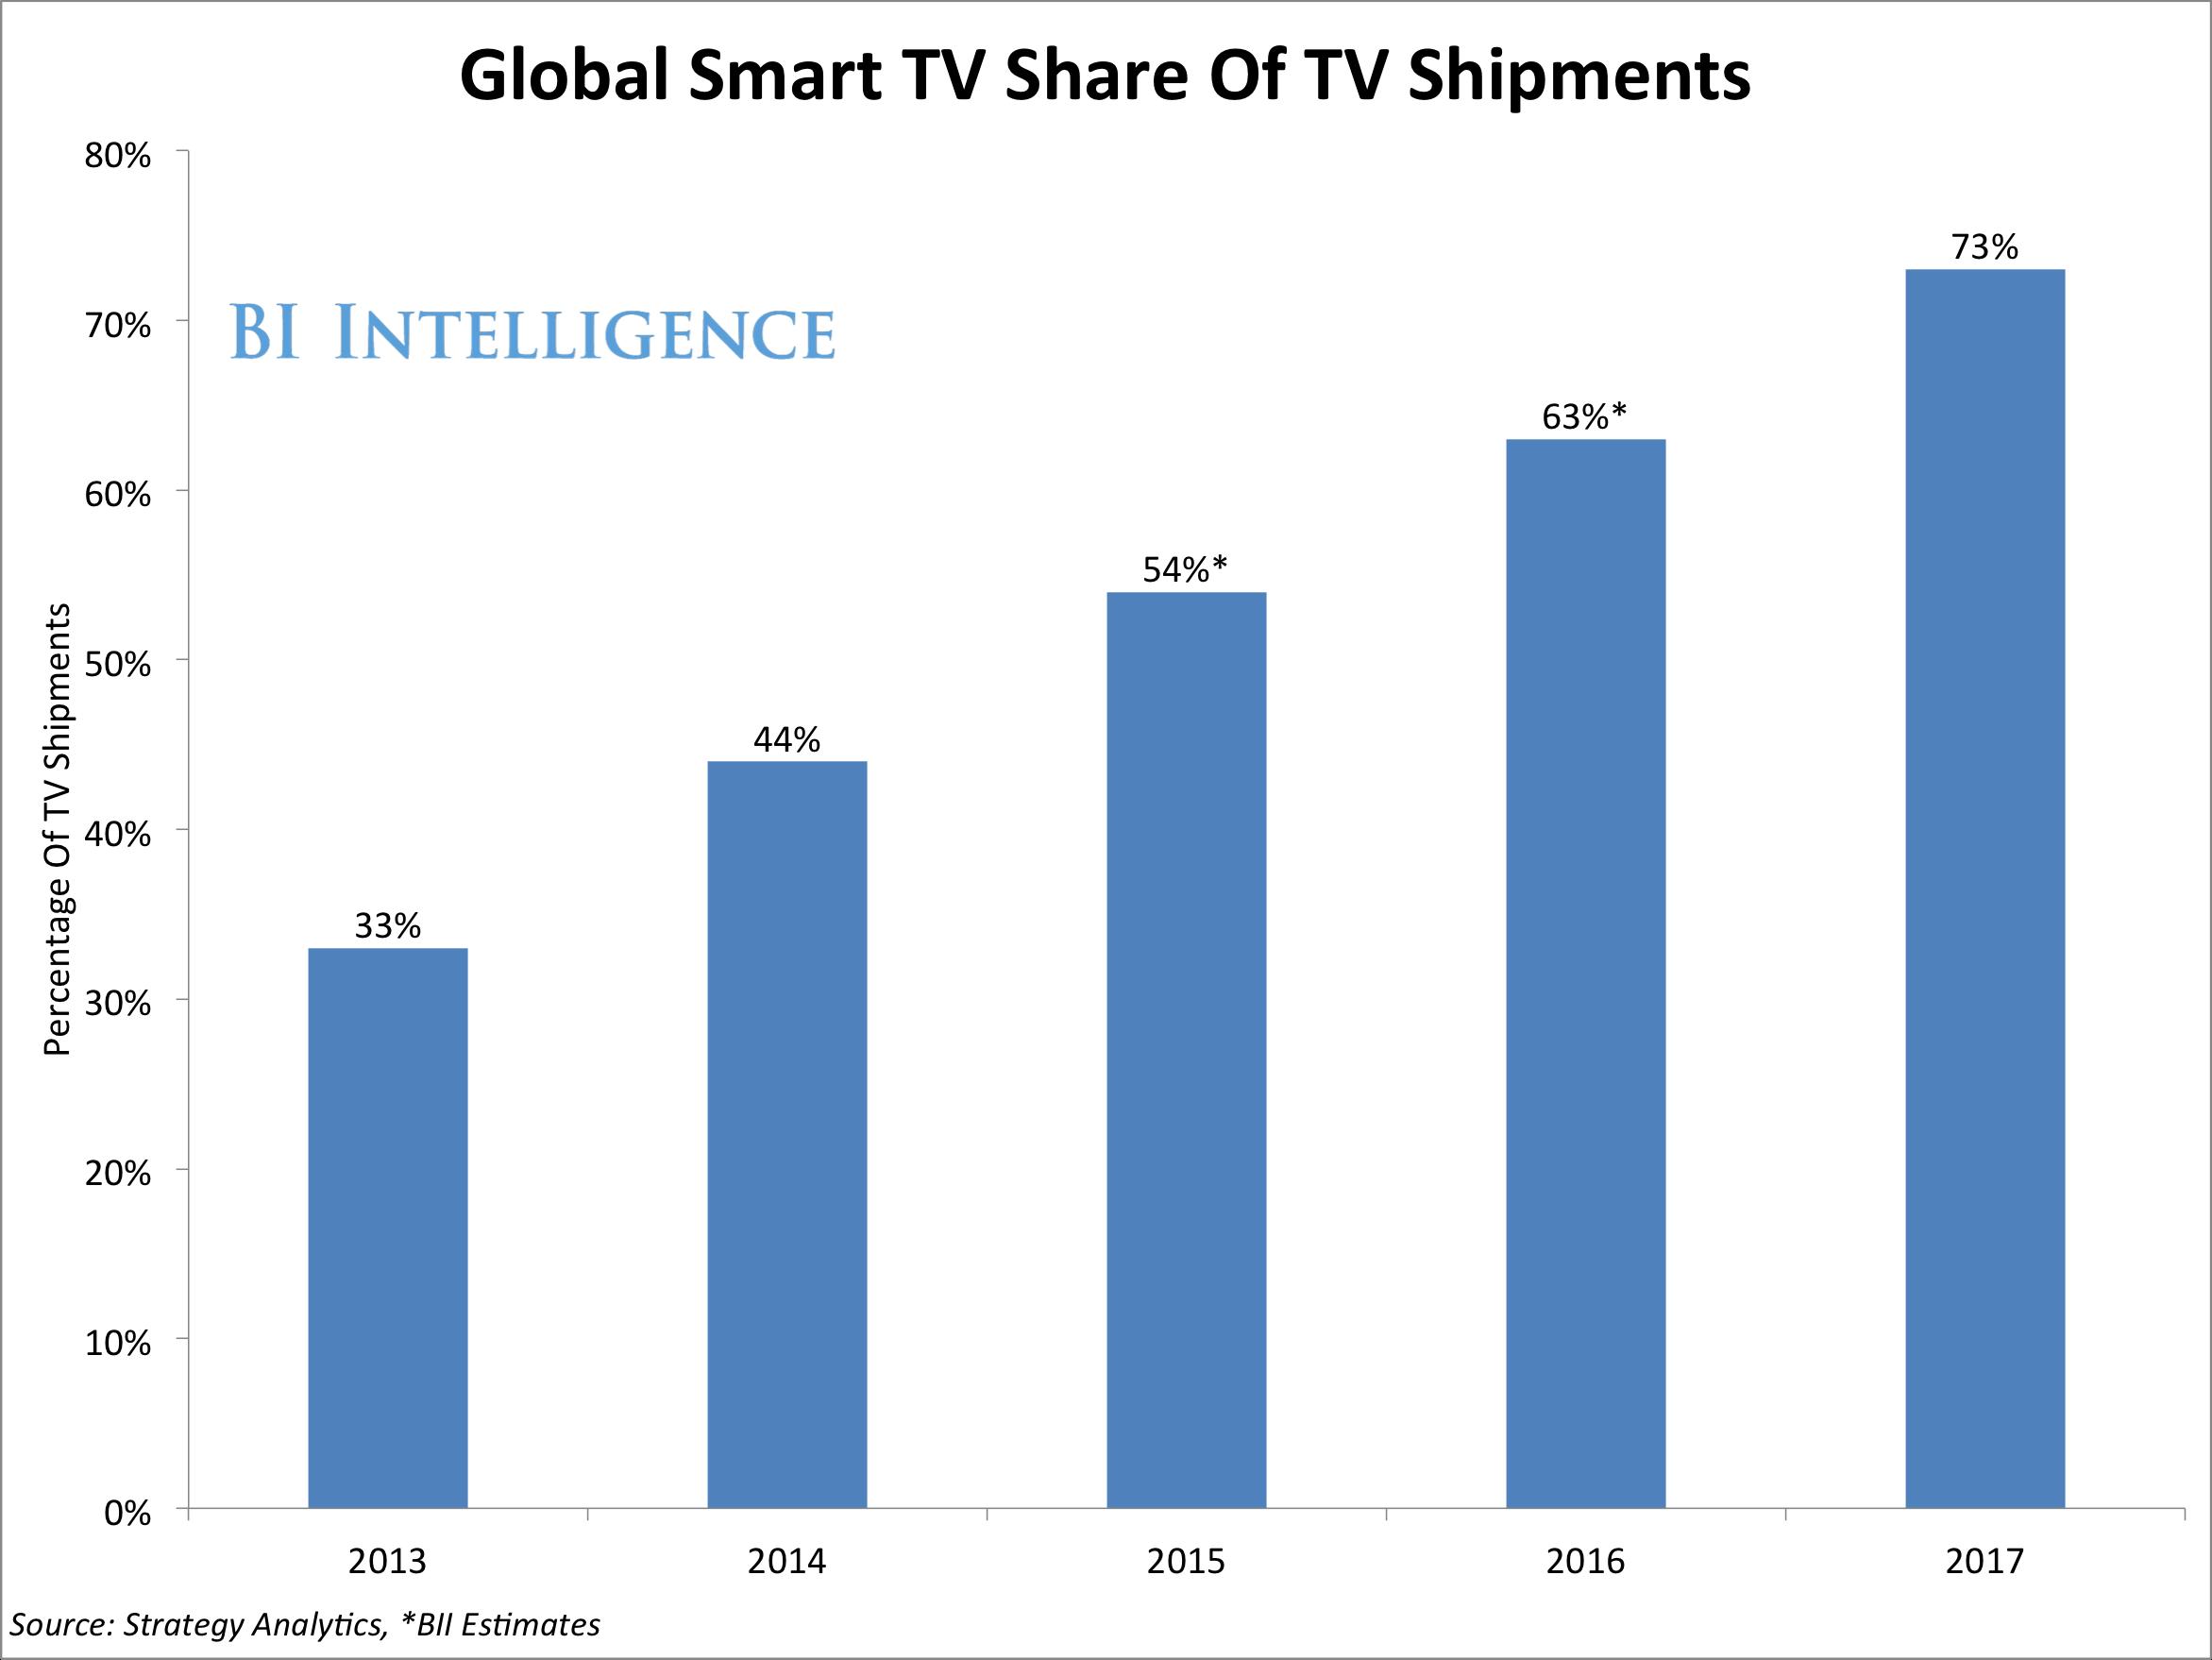 Smart TV shipments